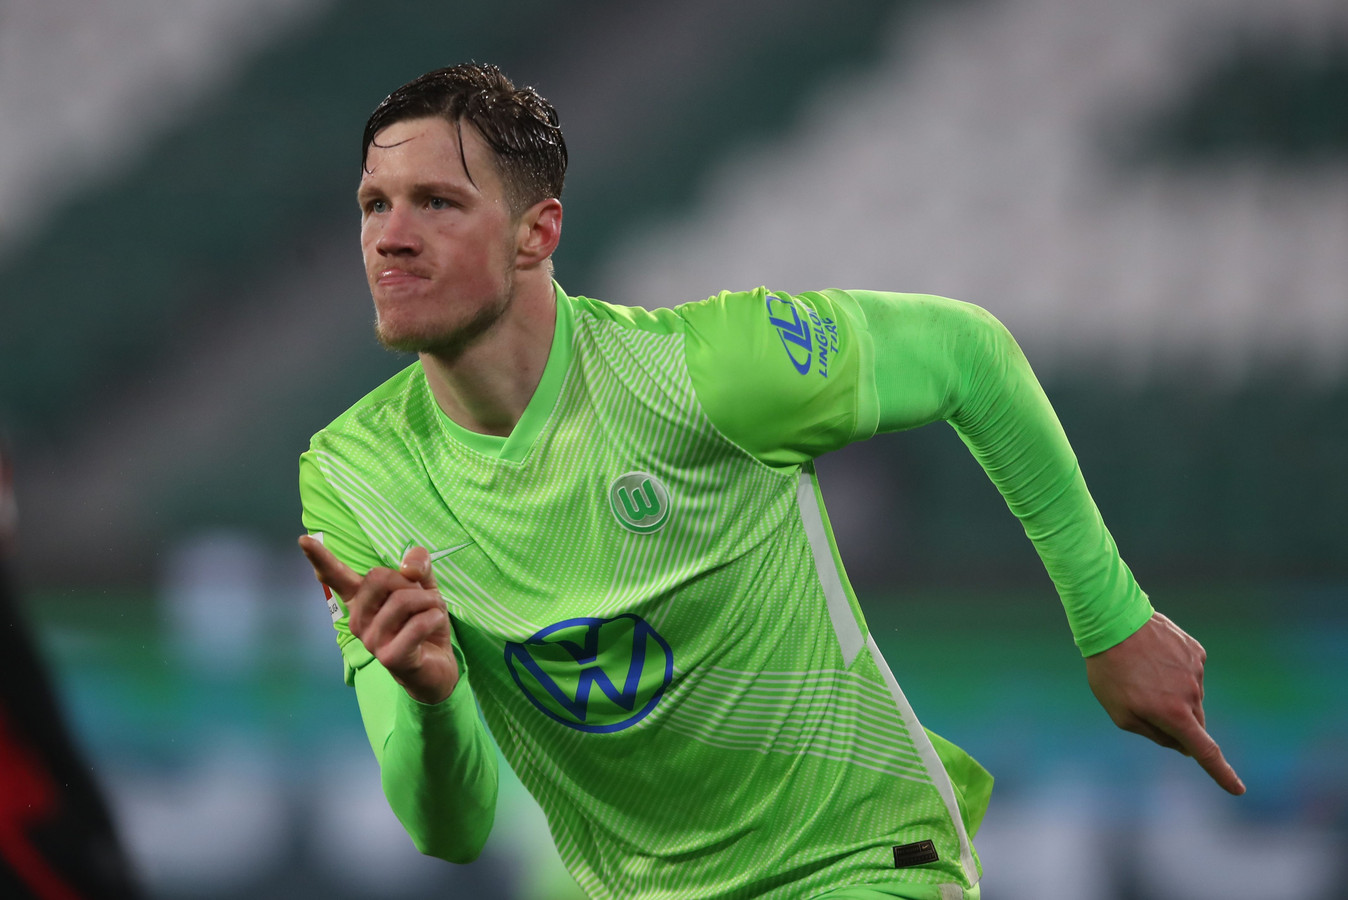 Wout Weghorst maakte dit seizoen al elf doelpunten.